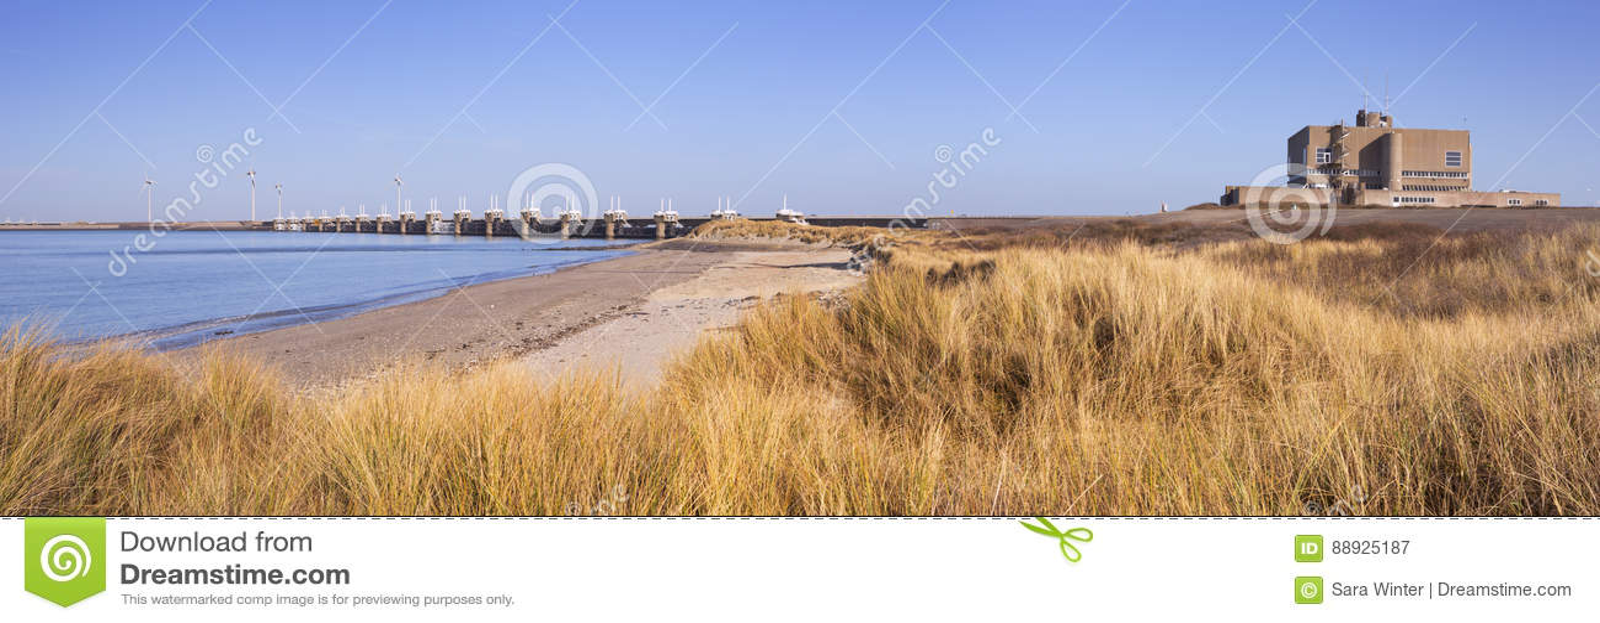 Eastern Scheldt Barrier at Neeltje Jans in The Netherlands